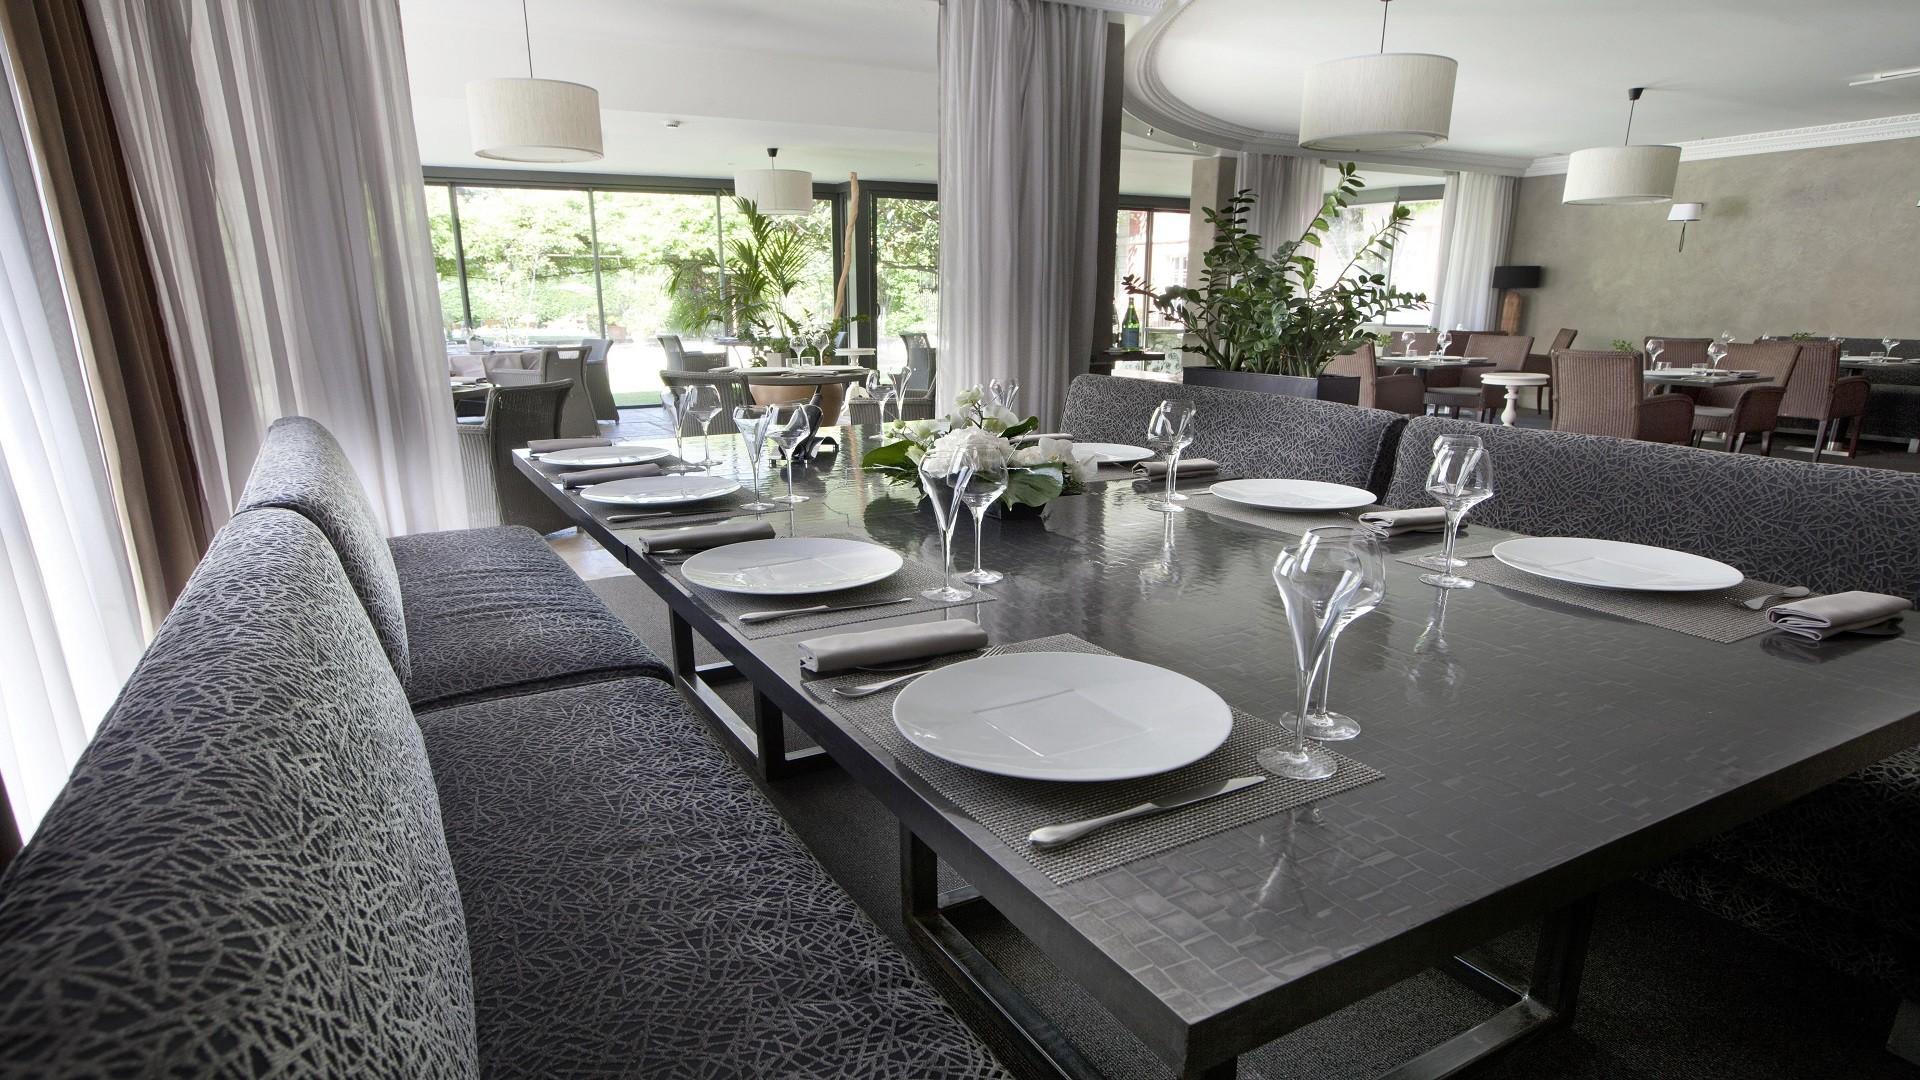 villa-augusta-drome-avignon-seminaires-de-caractere-gastro